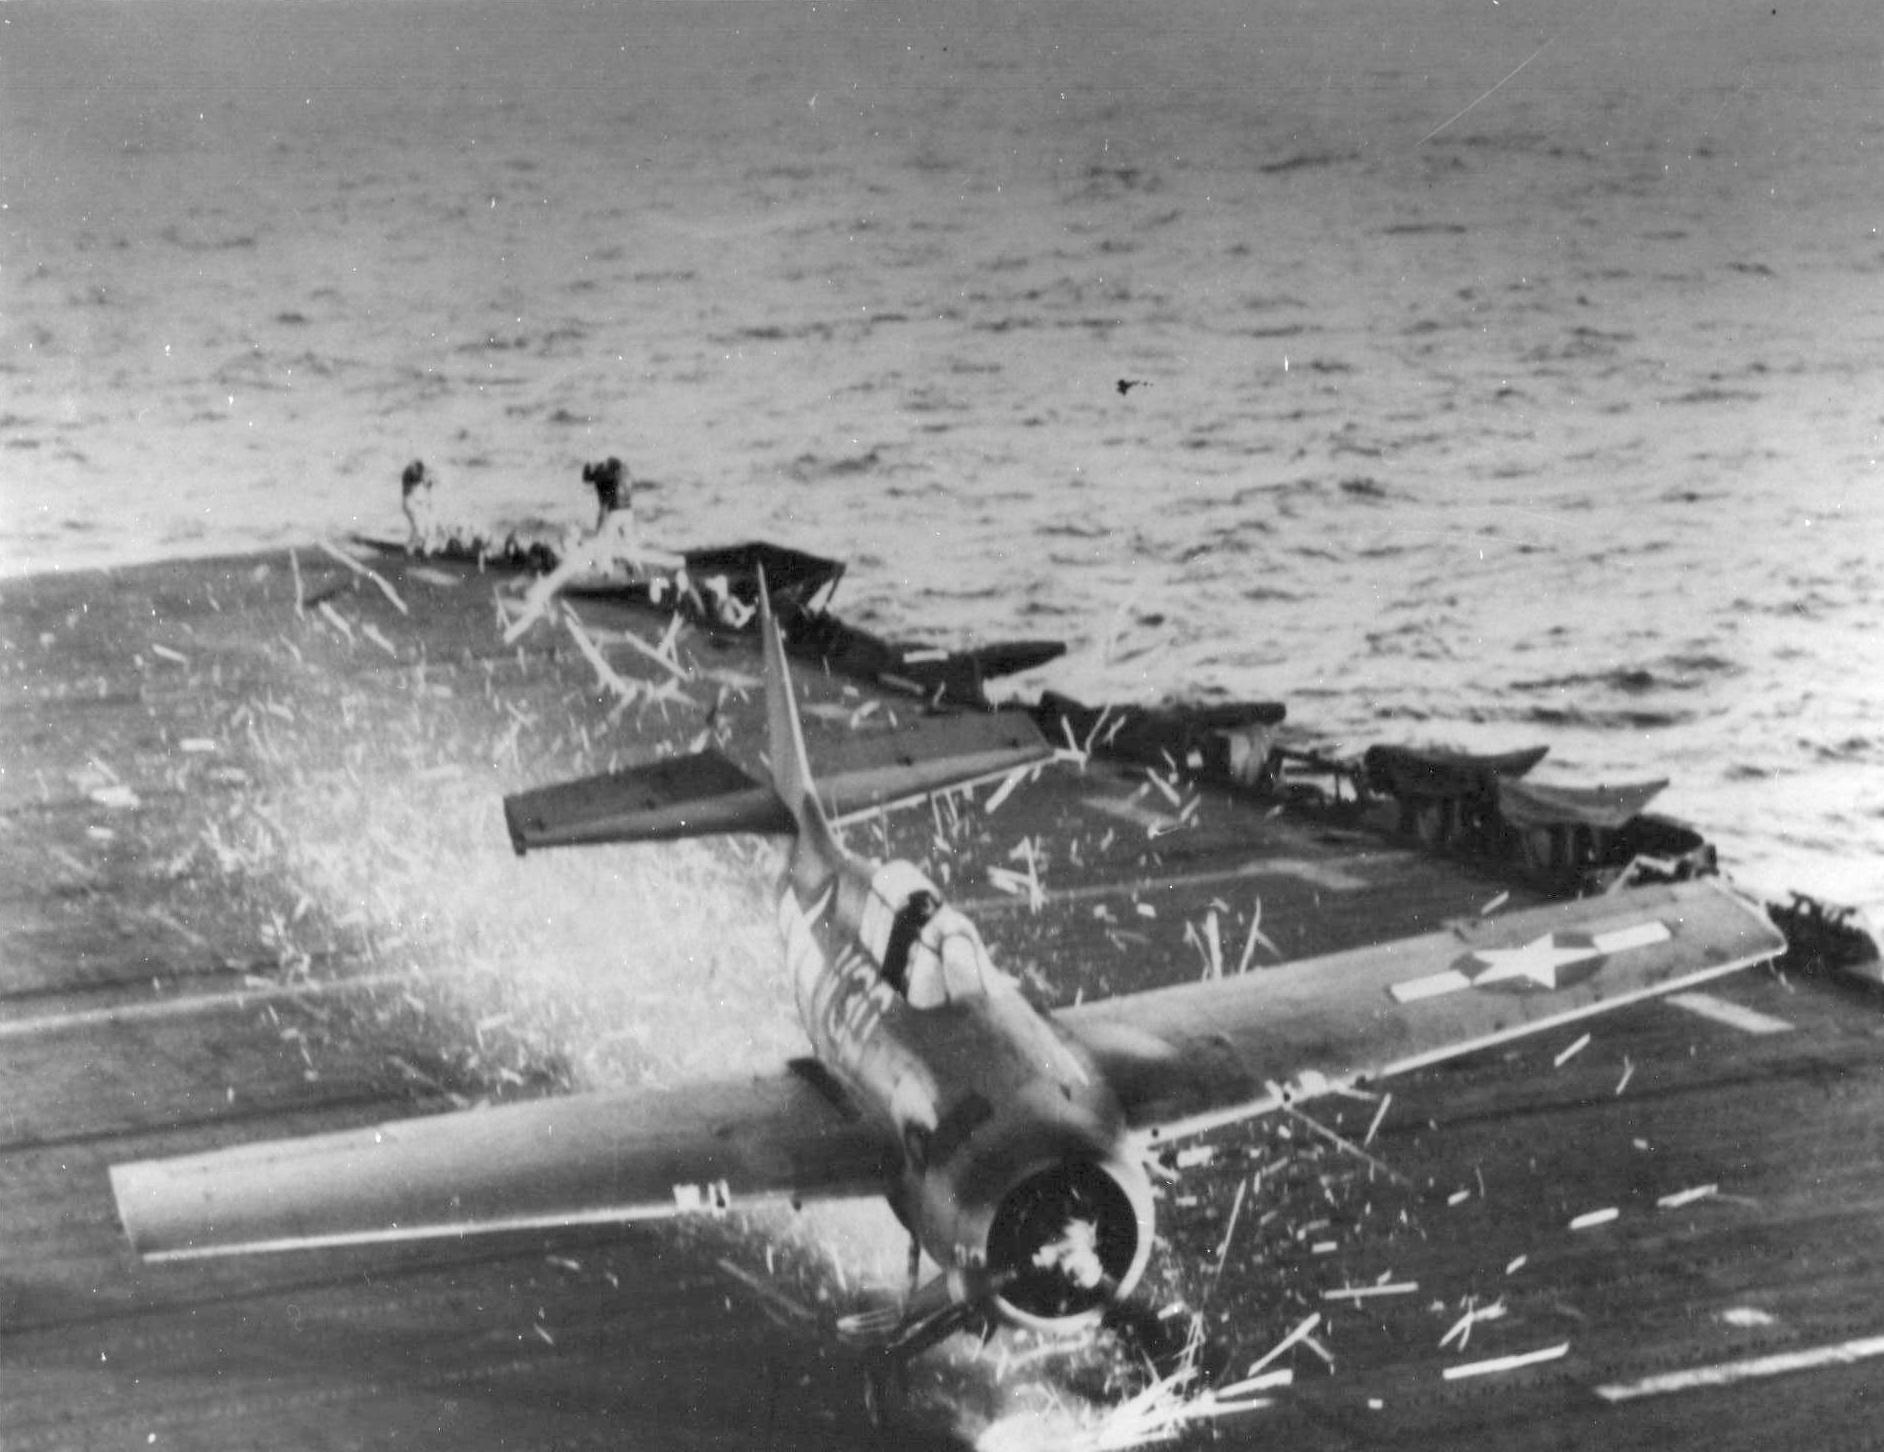 FM 2 Wildcat White 30 landing mishap 01